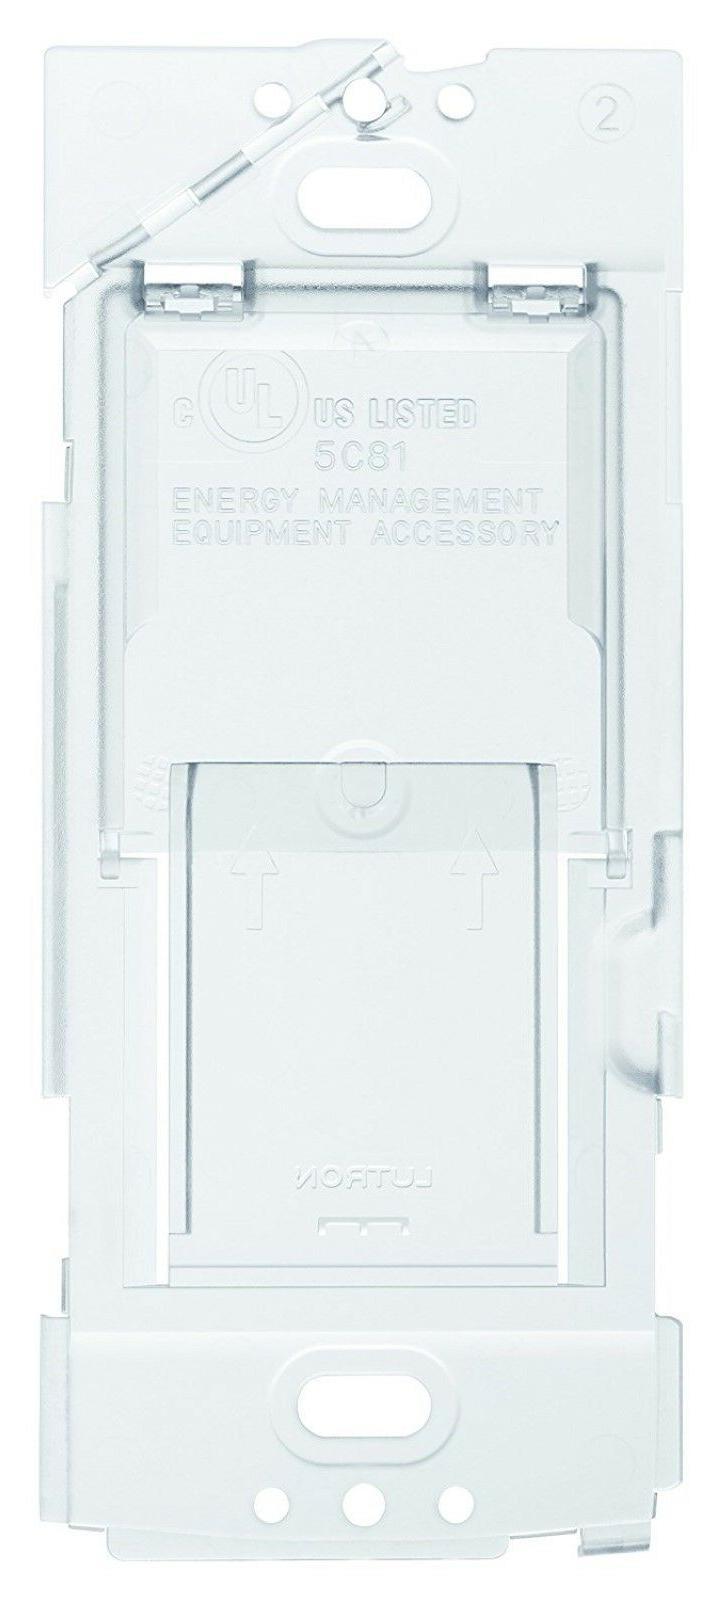 Wallplate Remote Control Dimmer Lutron Caseta Wireless Plug-In